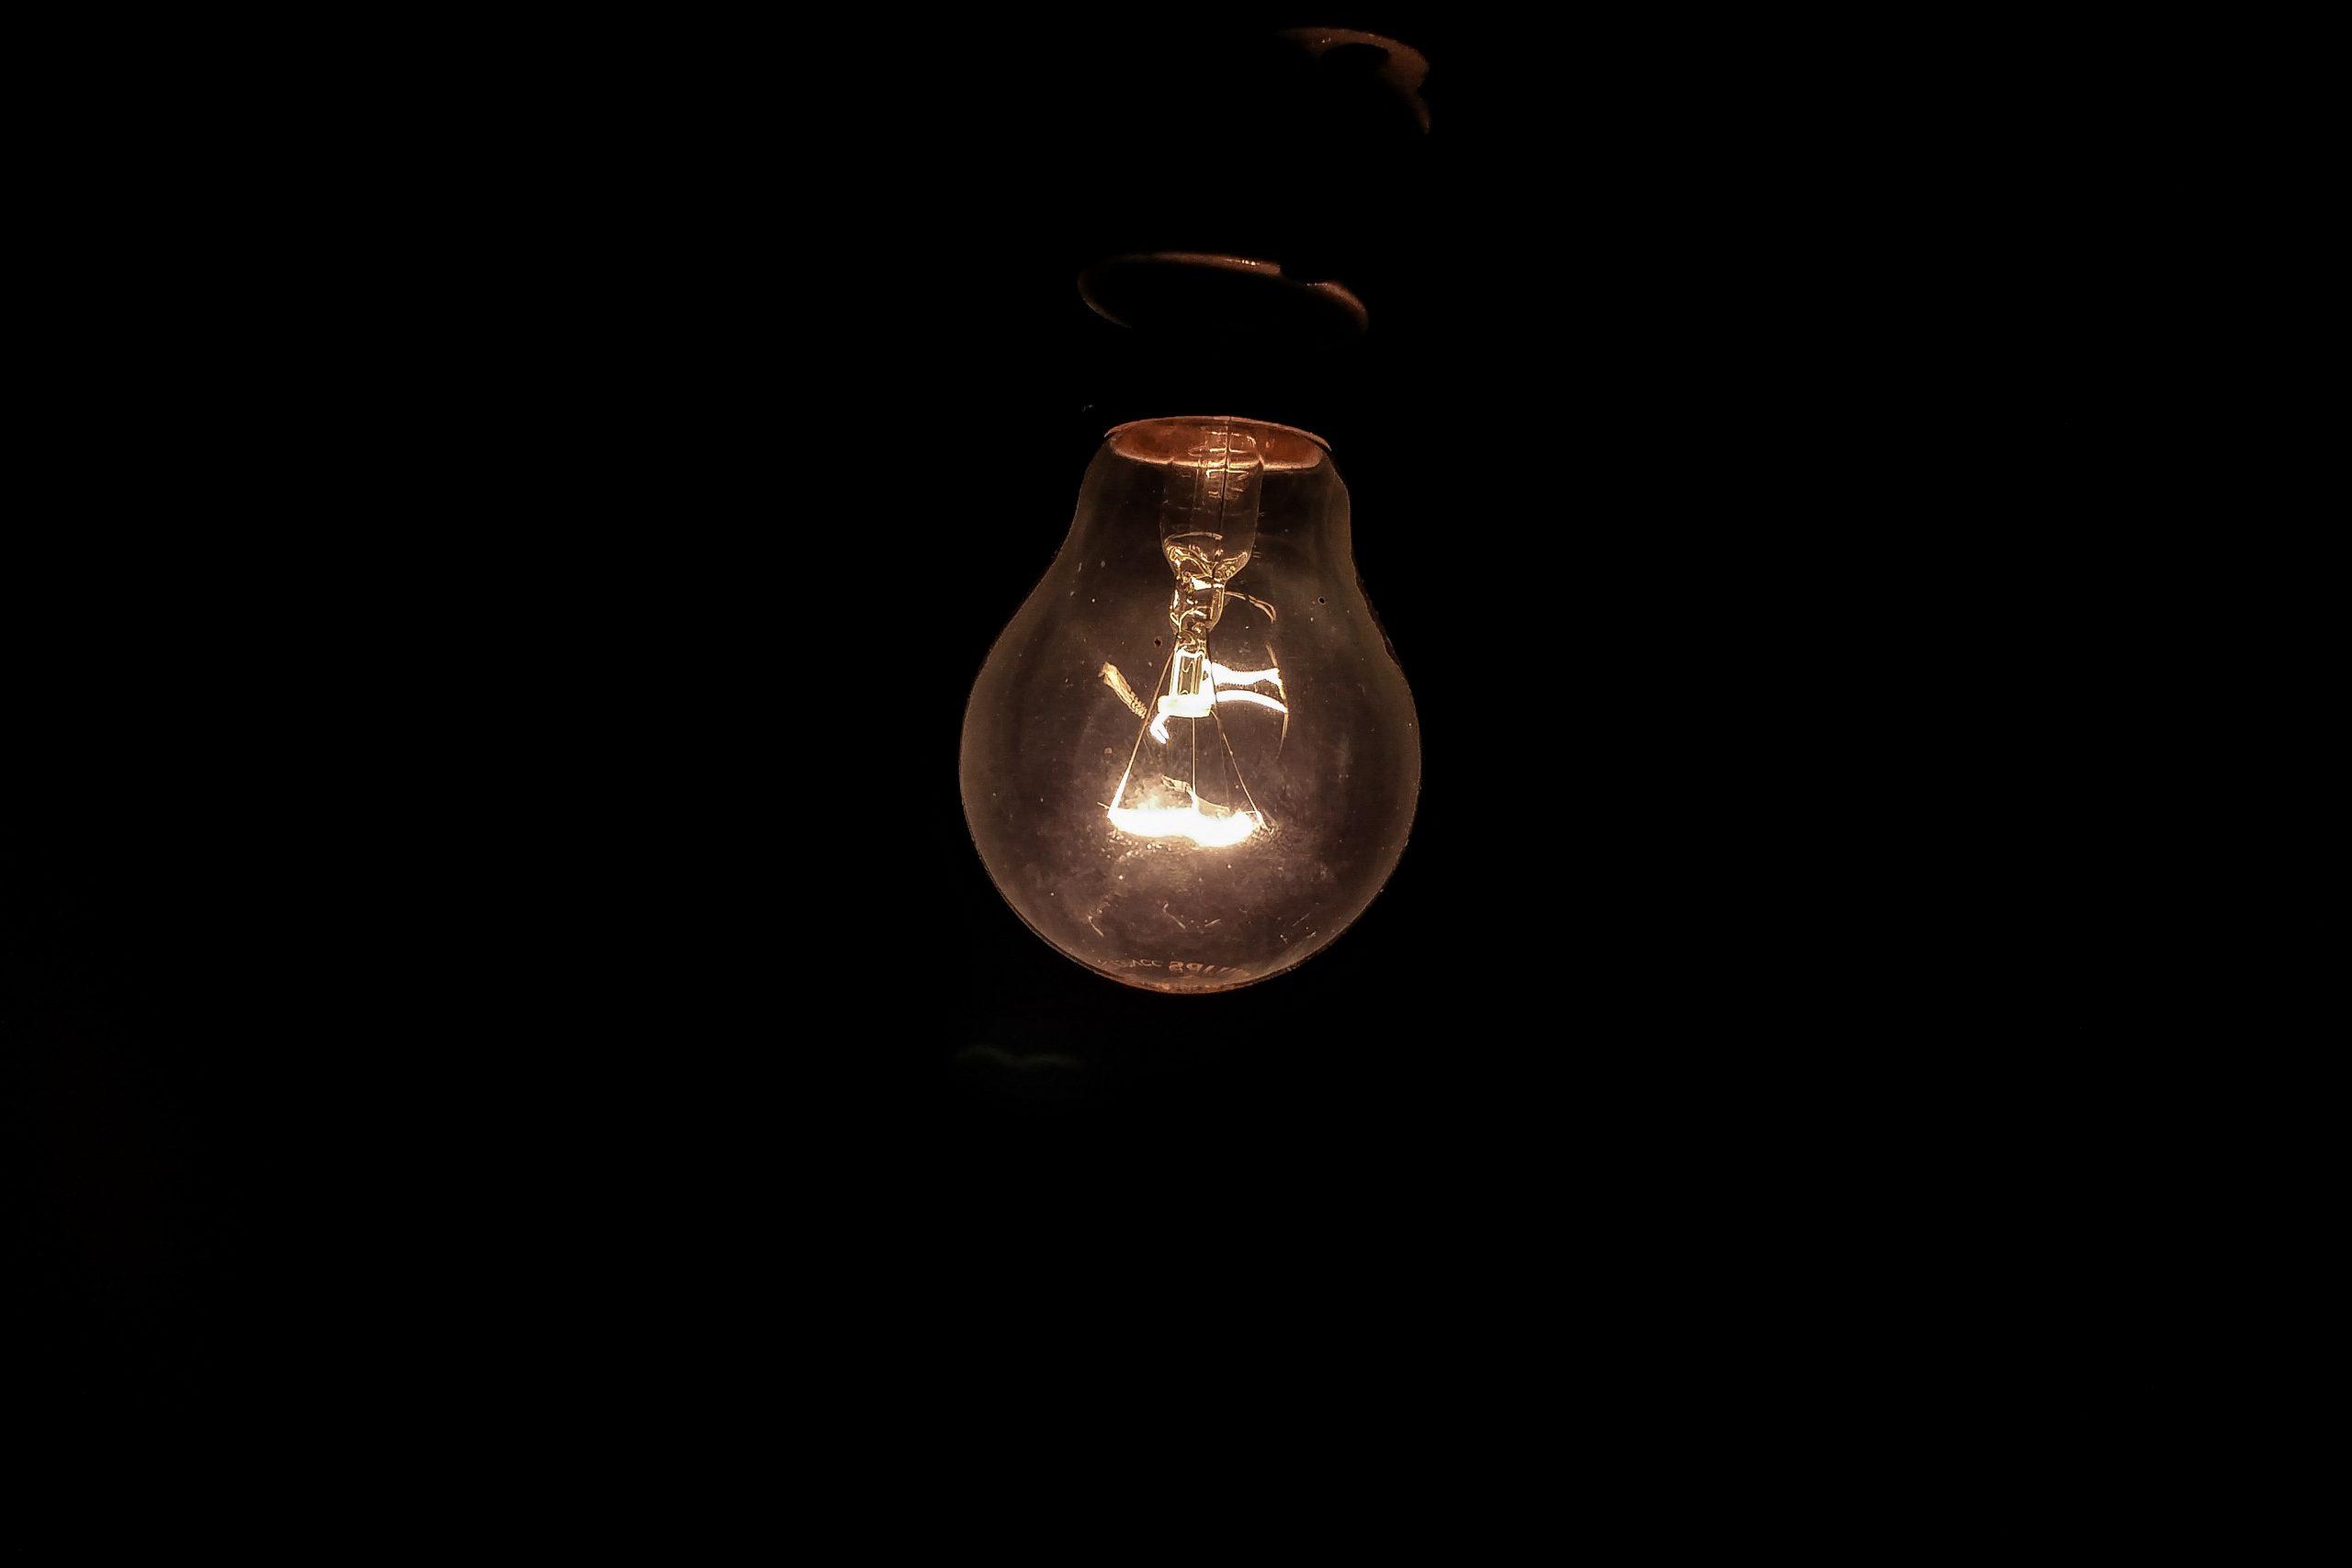 Incandescent light bulb on Dark Background